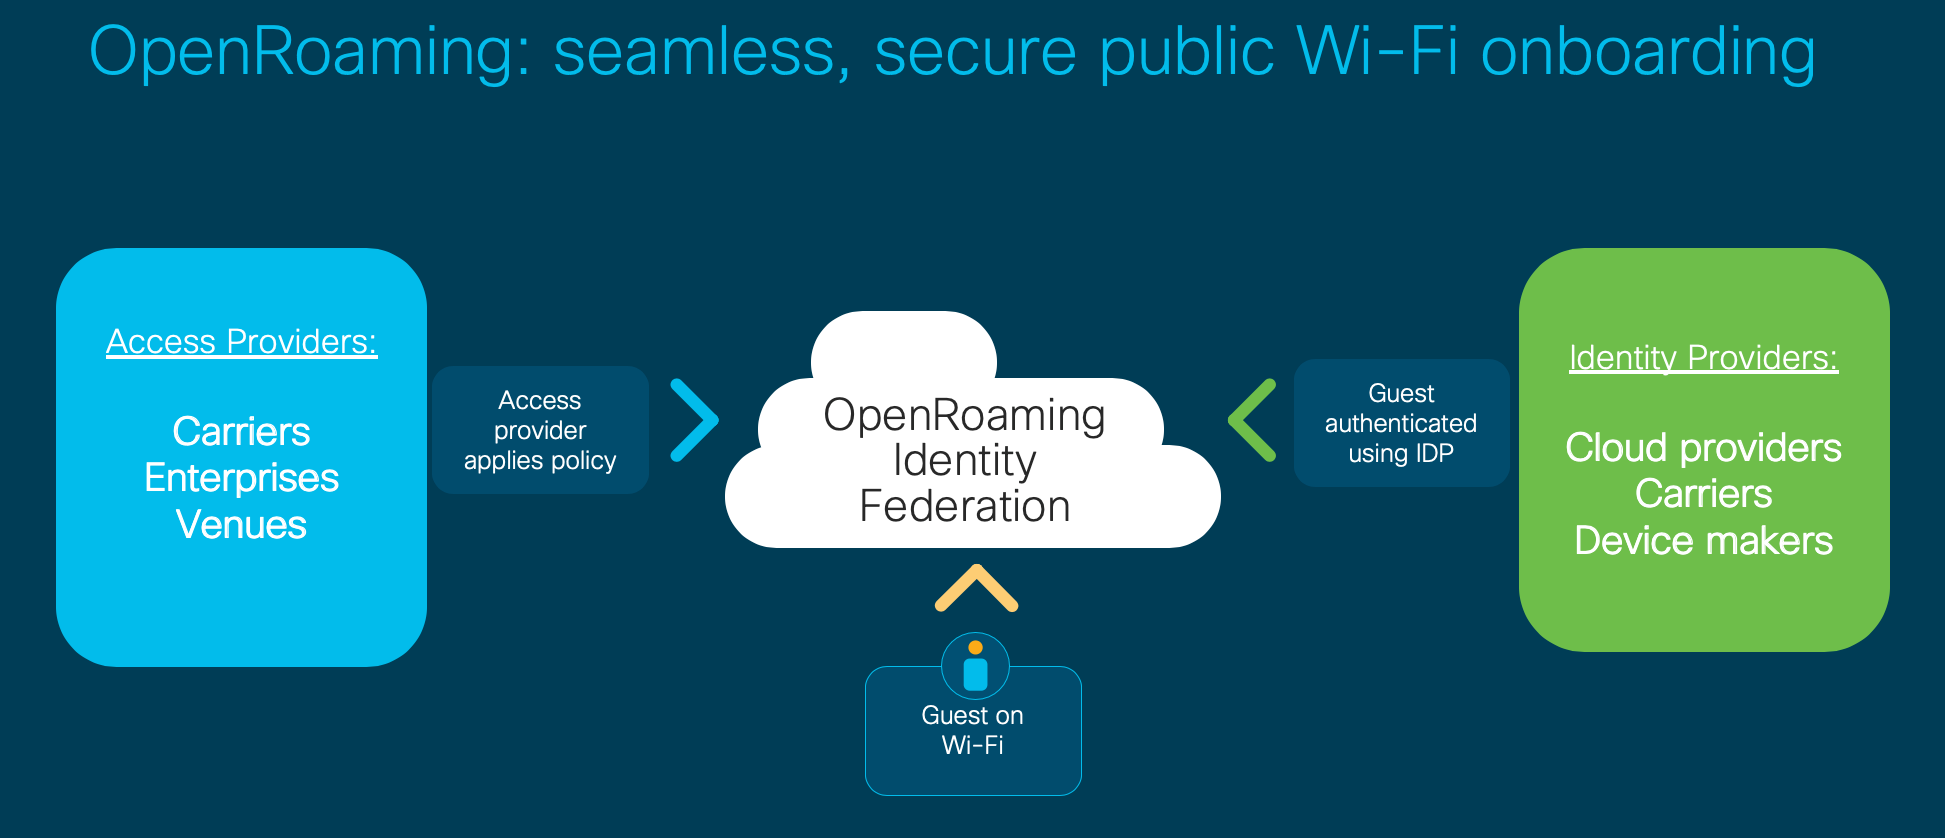 Cisco OpenRoaming: Seamless, secure public wi-fi onboarding